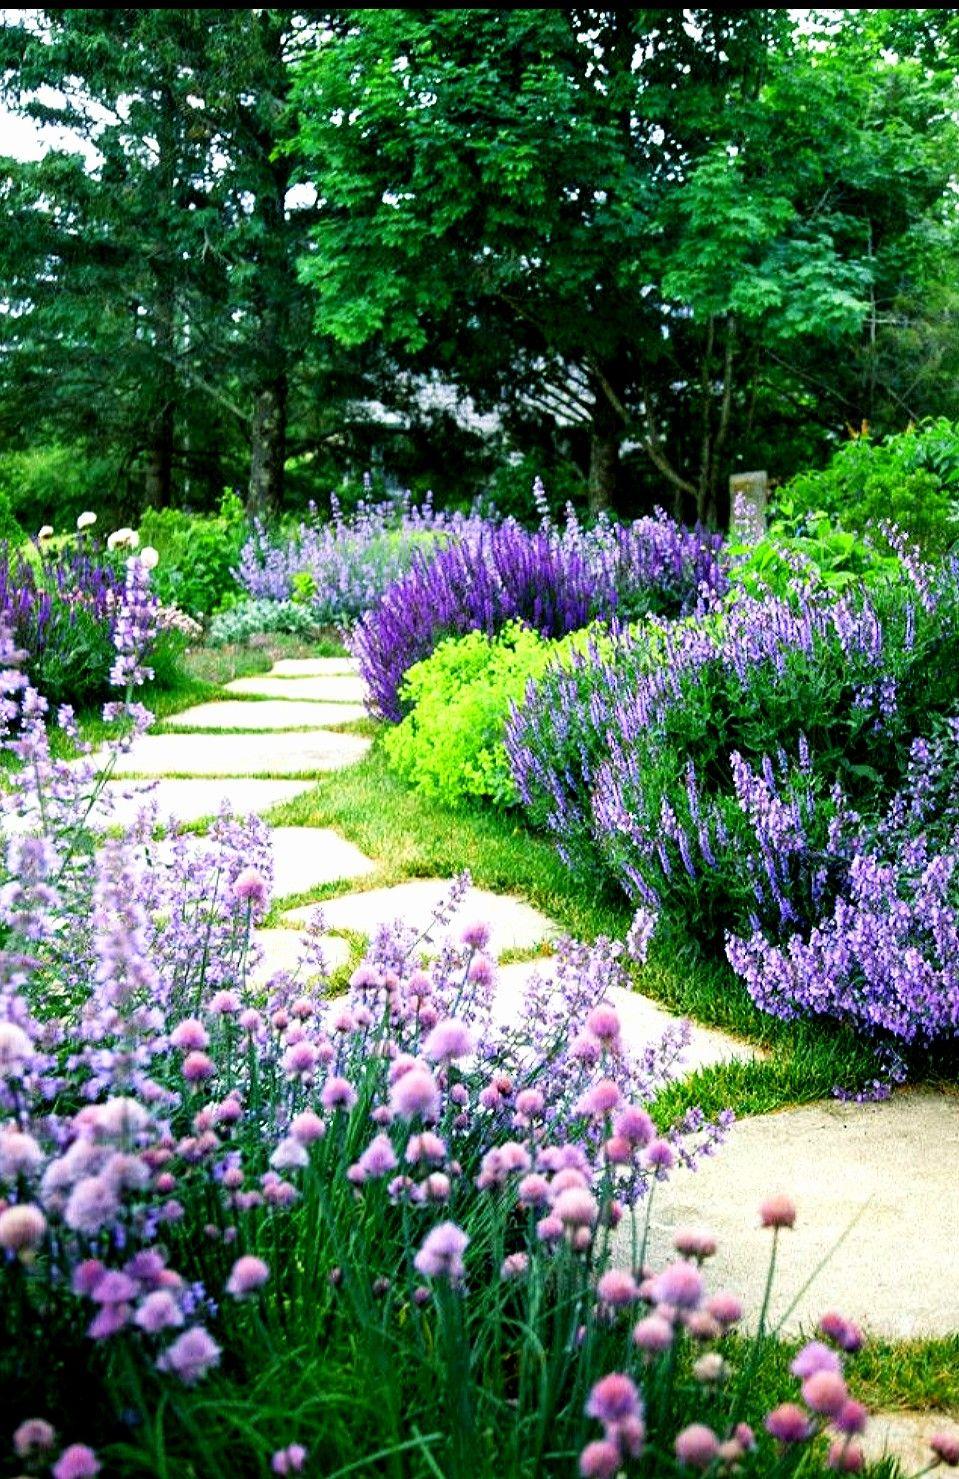 House garden landscape  Pin by Judith Ottema on Tuin  Pinterest  Gardens Garden ideas and